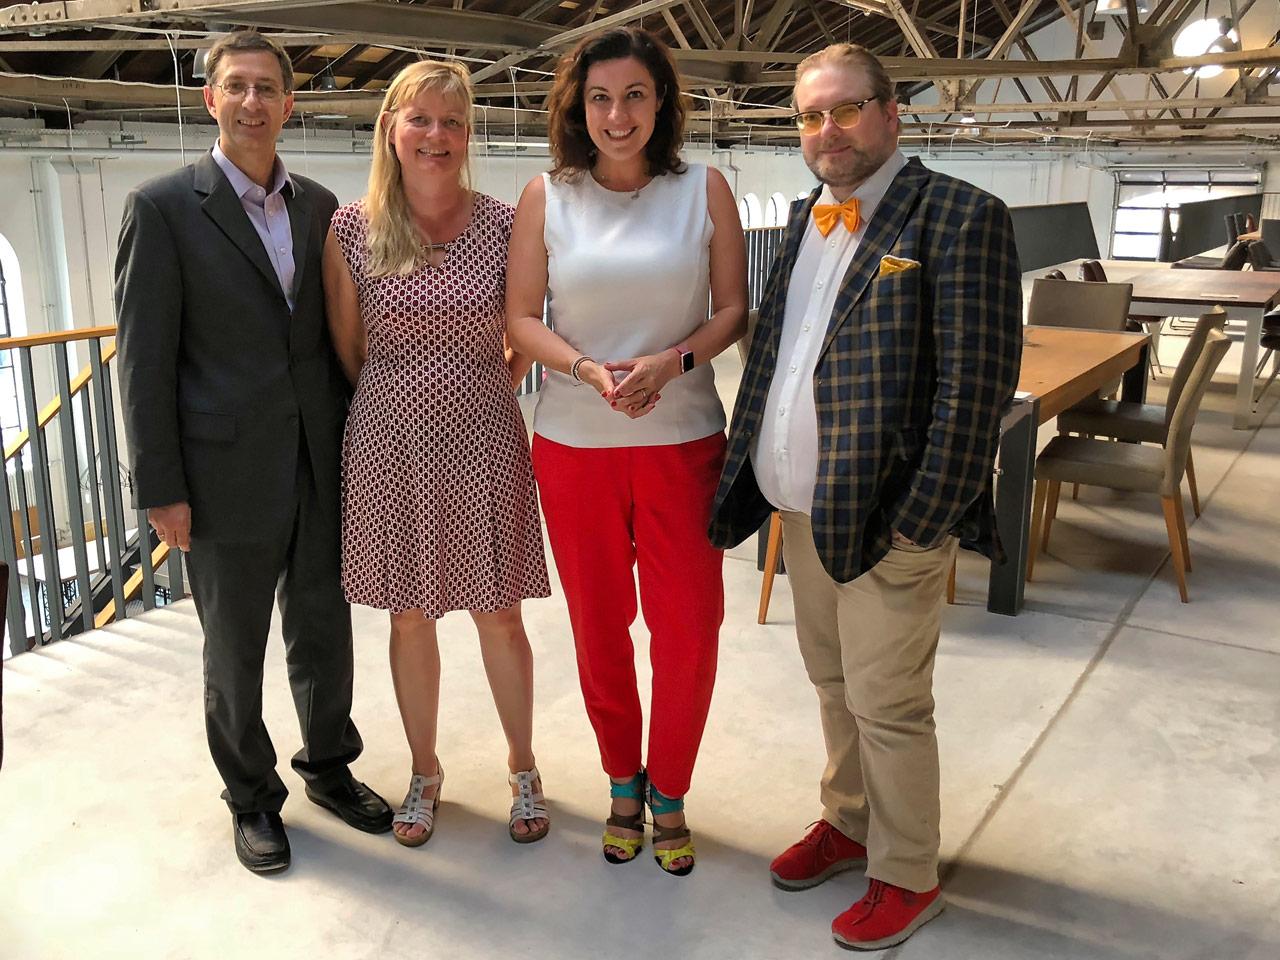 Dorothee Bär mit Bloggerclub-Vorstand (v.l.) Franz Neumeier, Tanja Praske, Matthias J. Lange